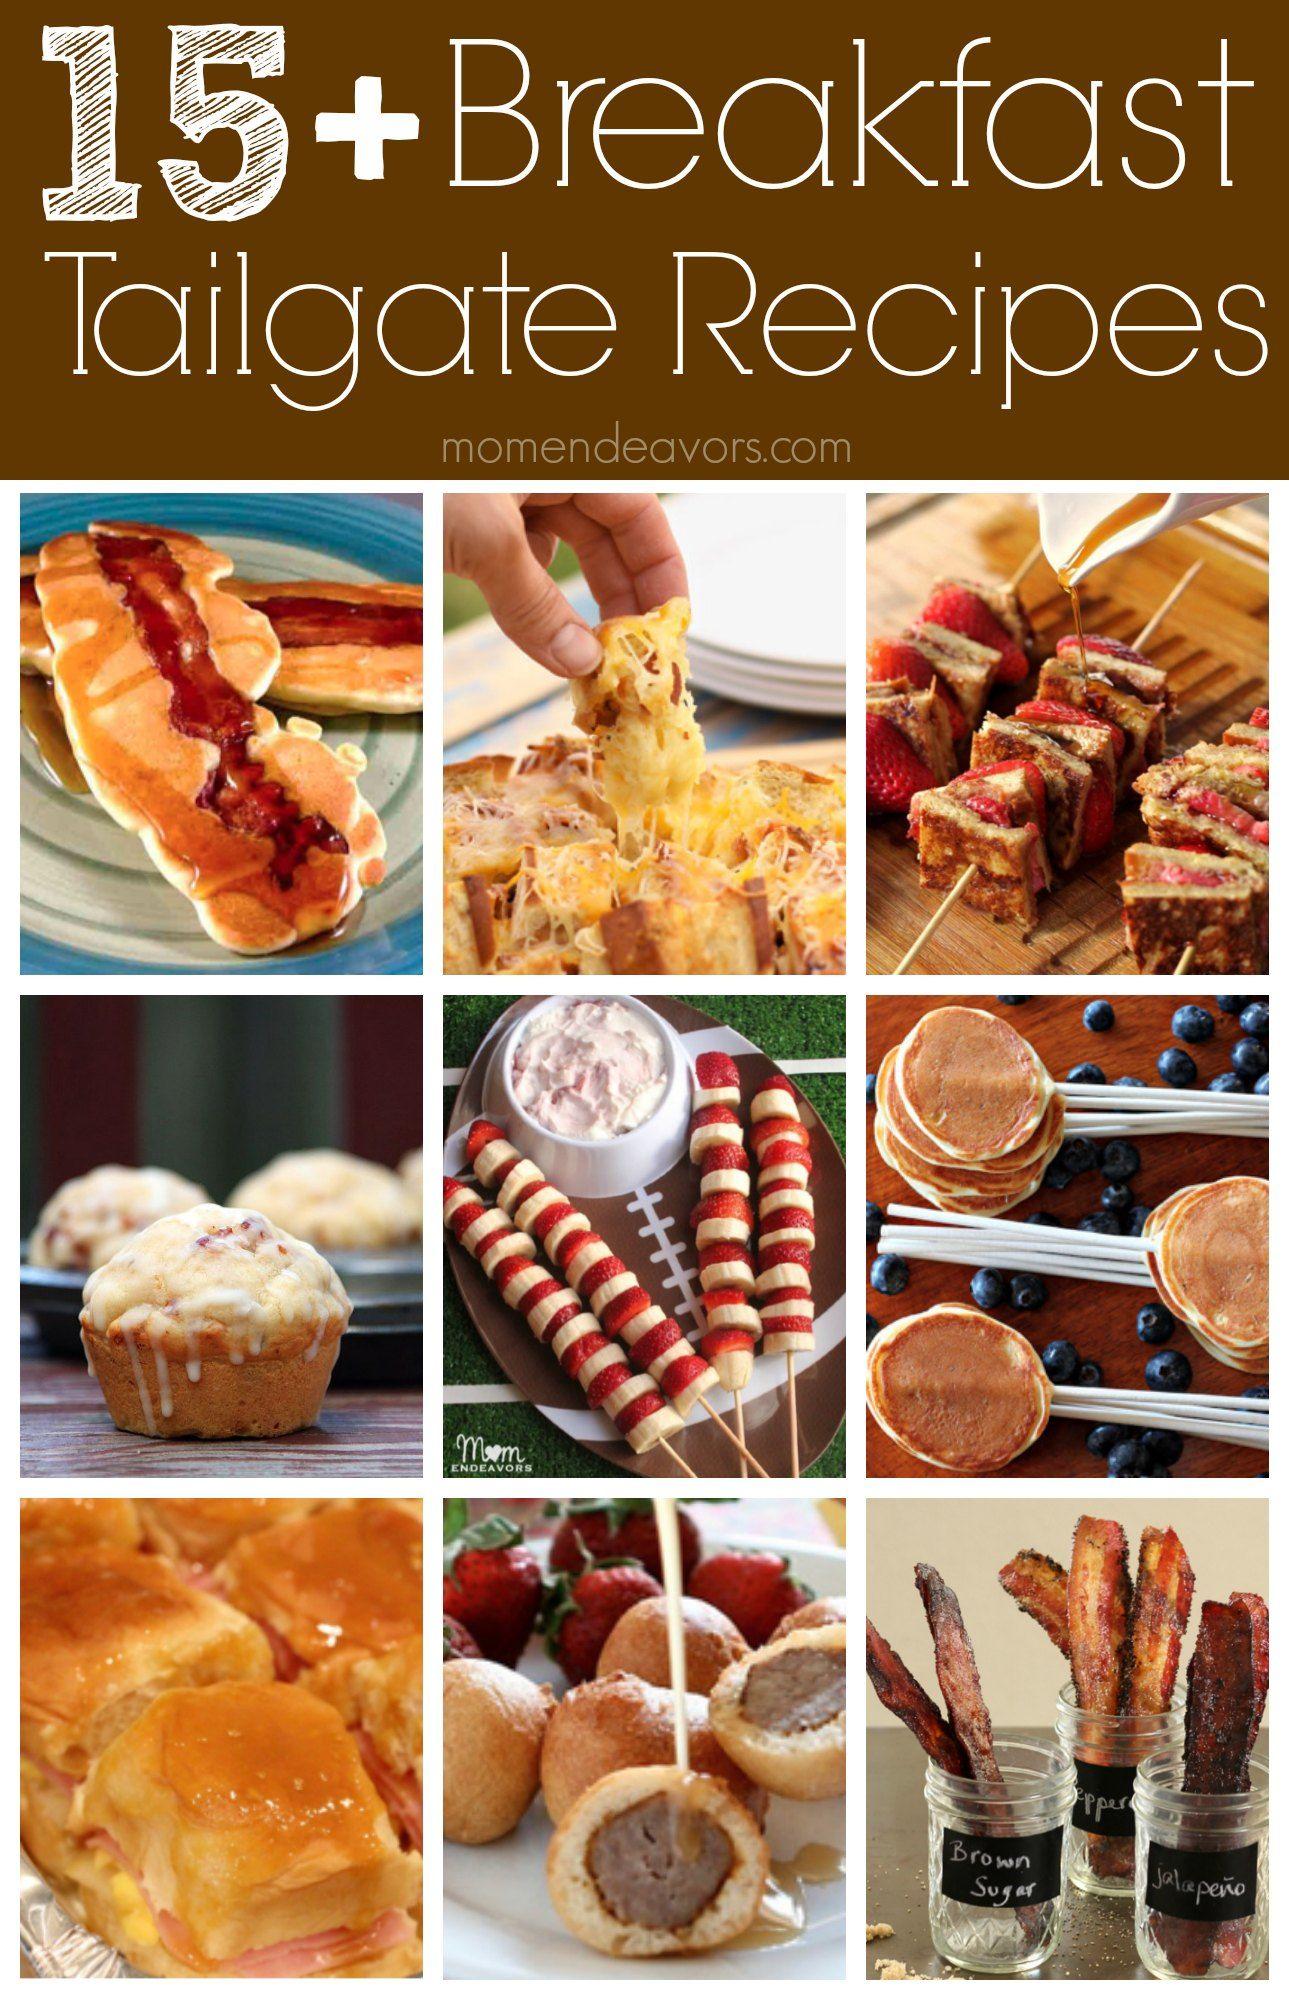 15+ Breakfast Tailgate Recipes #tailgatefood